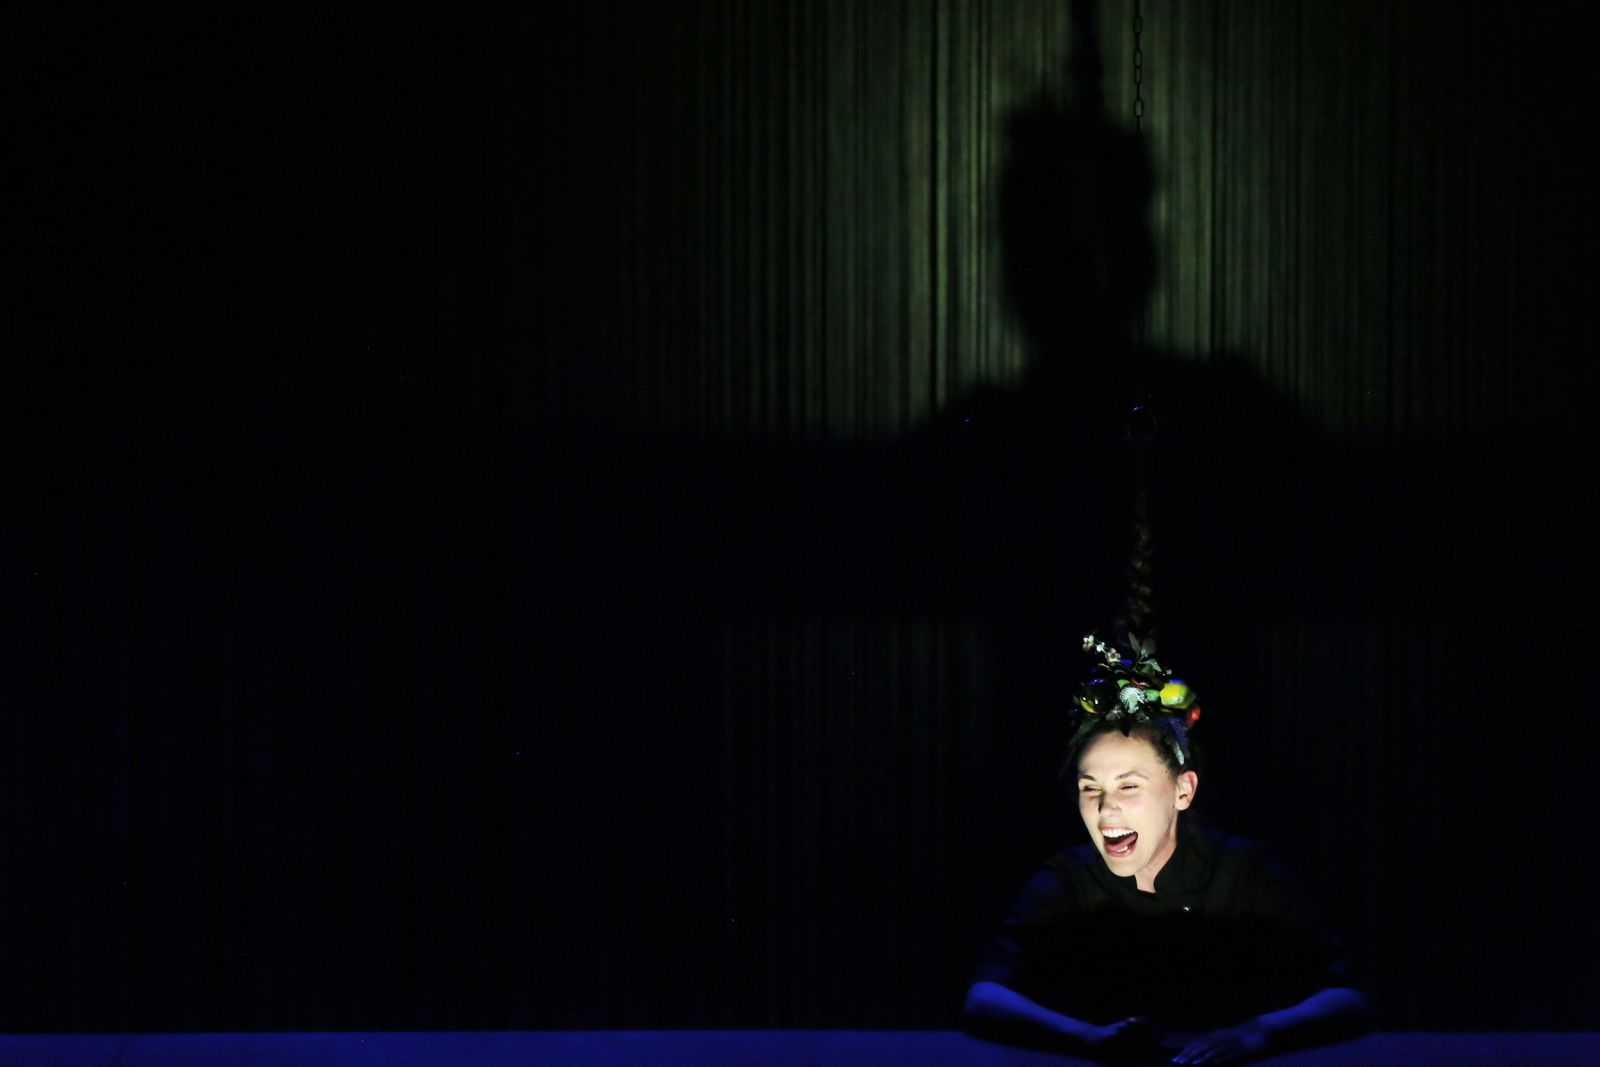 Danse 2021 - Flora Detraz - 04